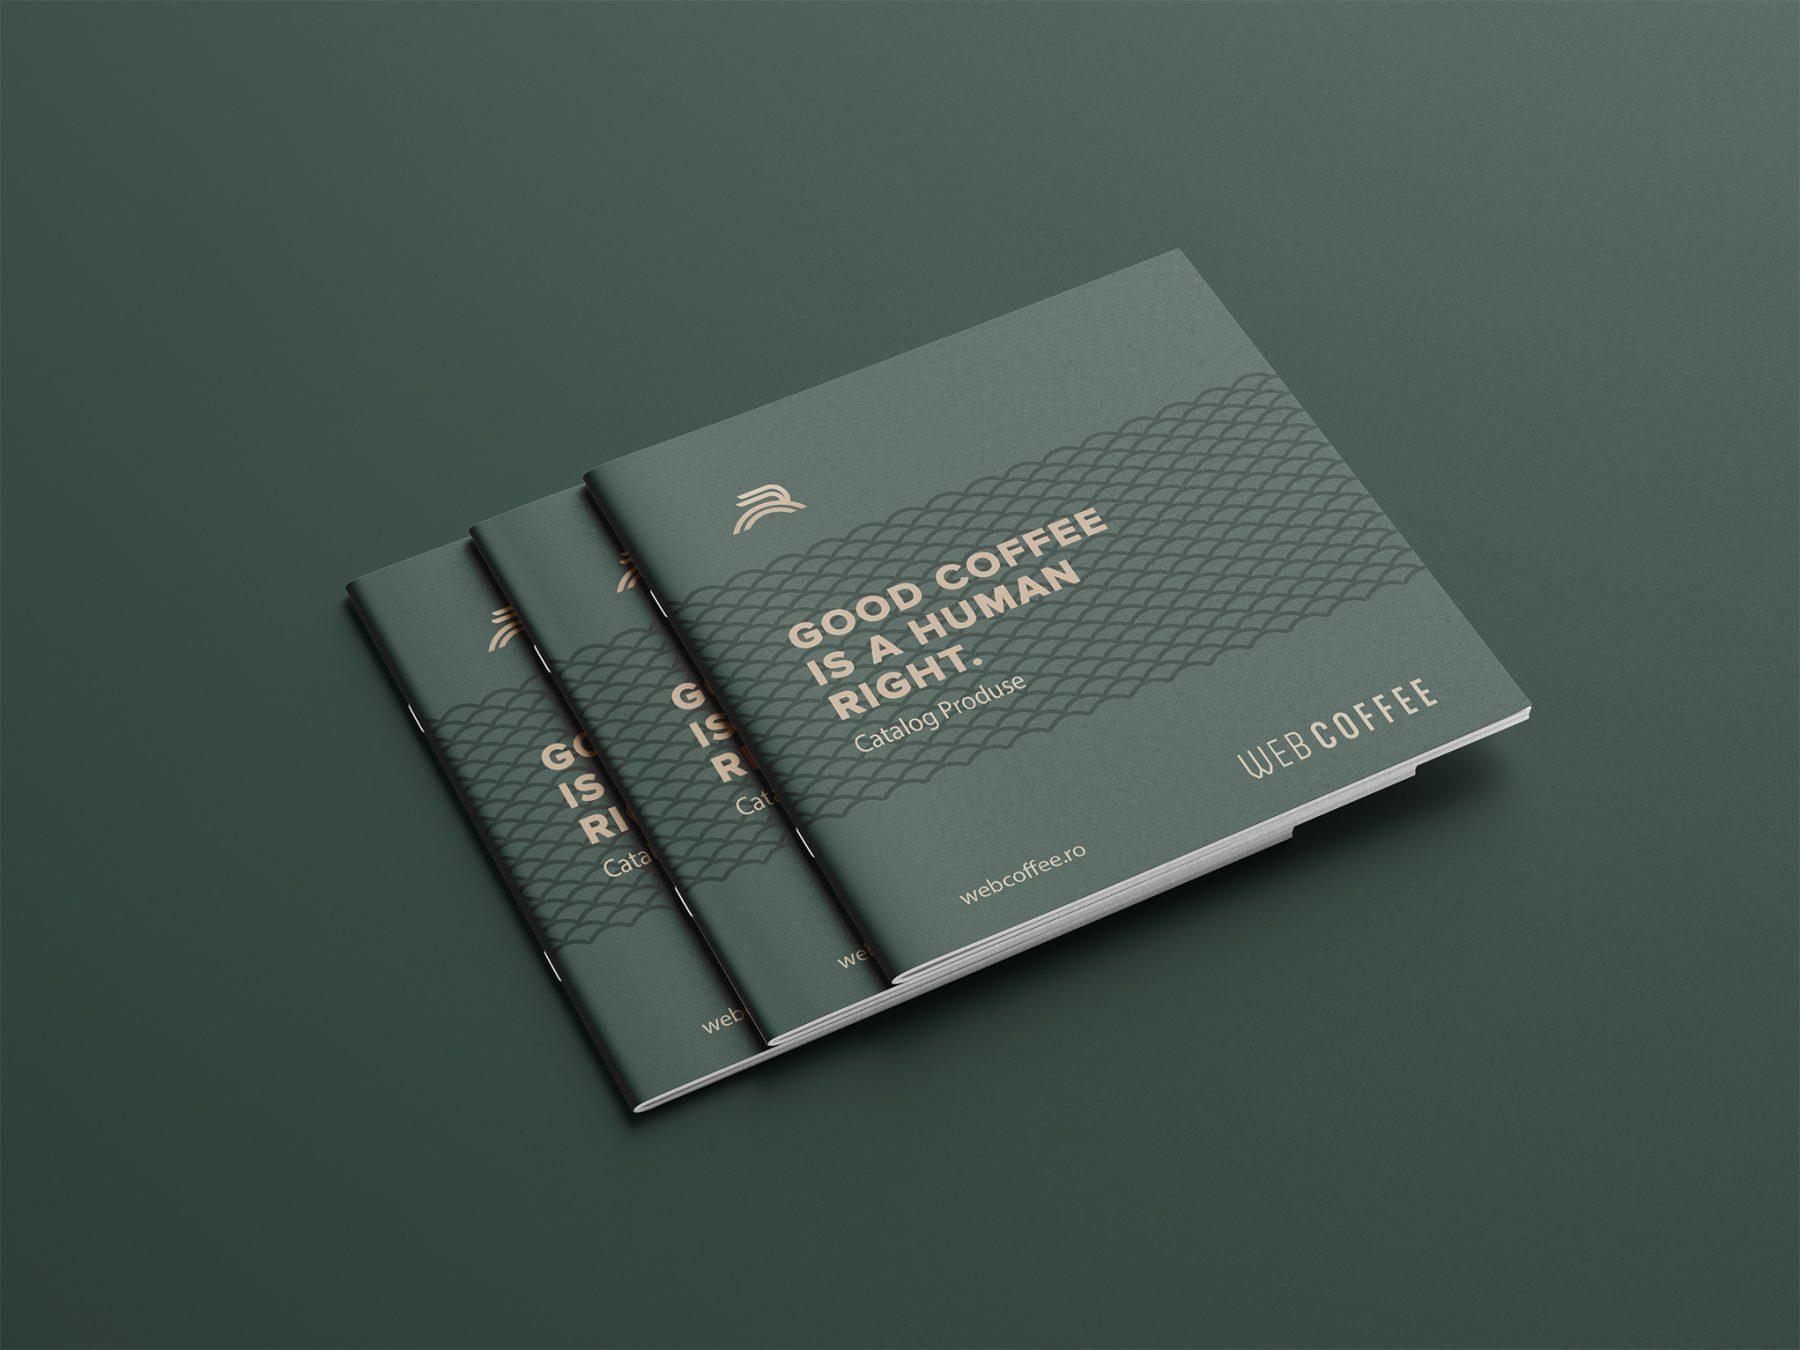 Web Coffee Catalogue Design